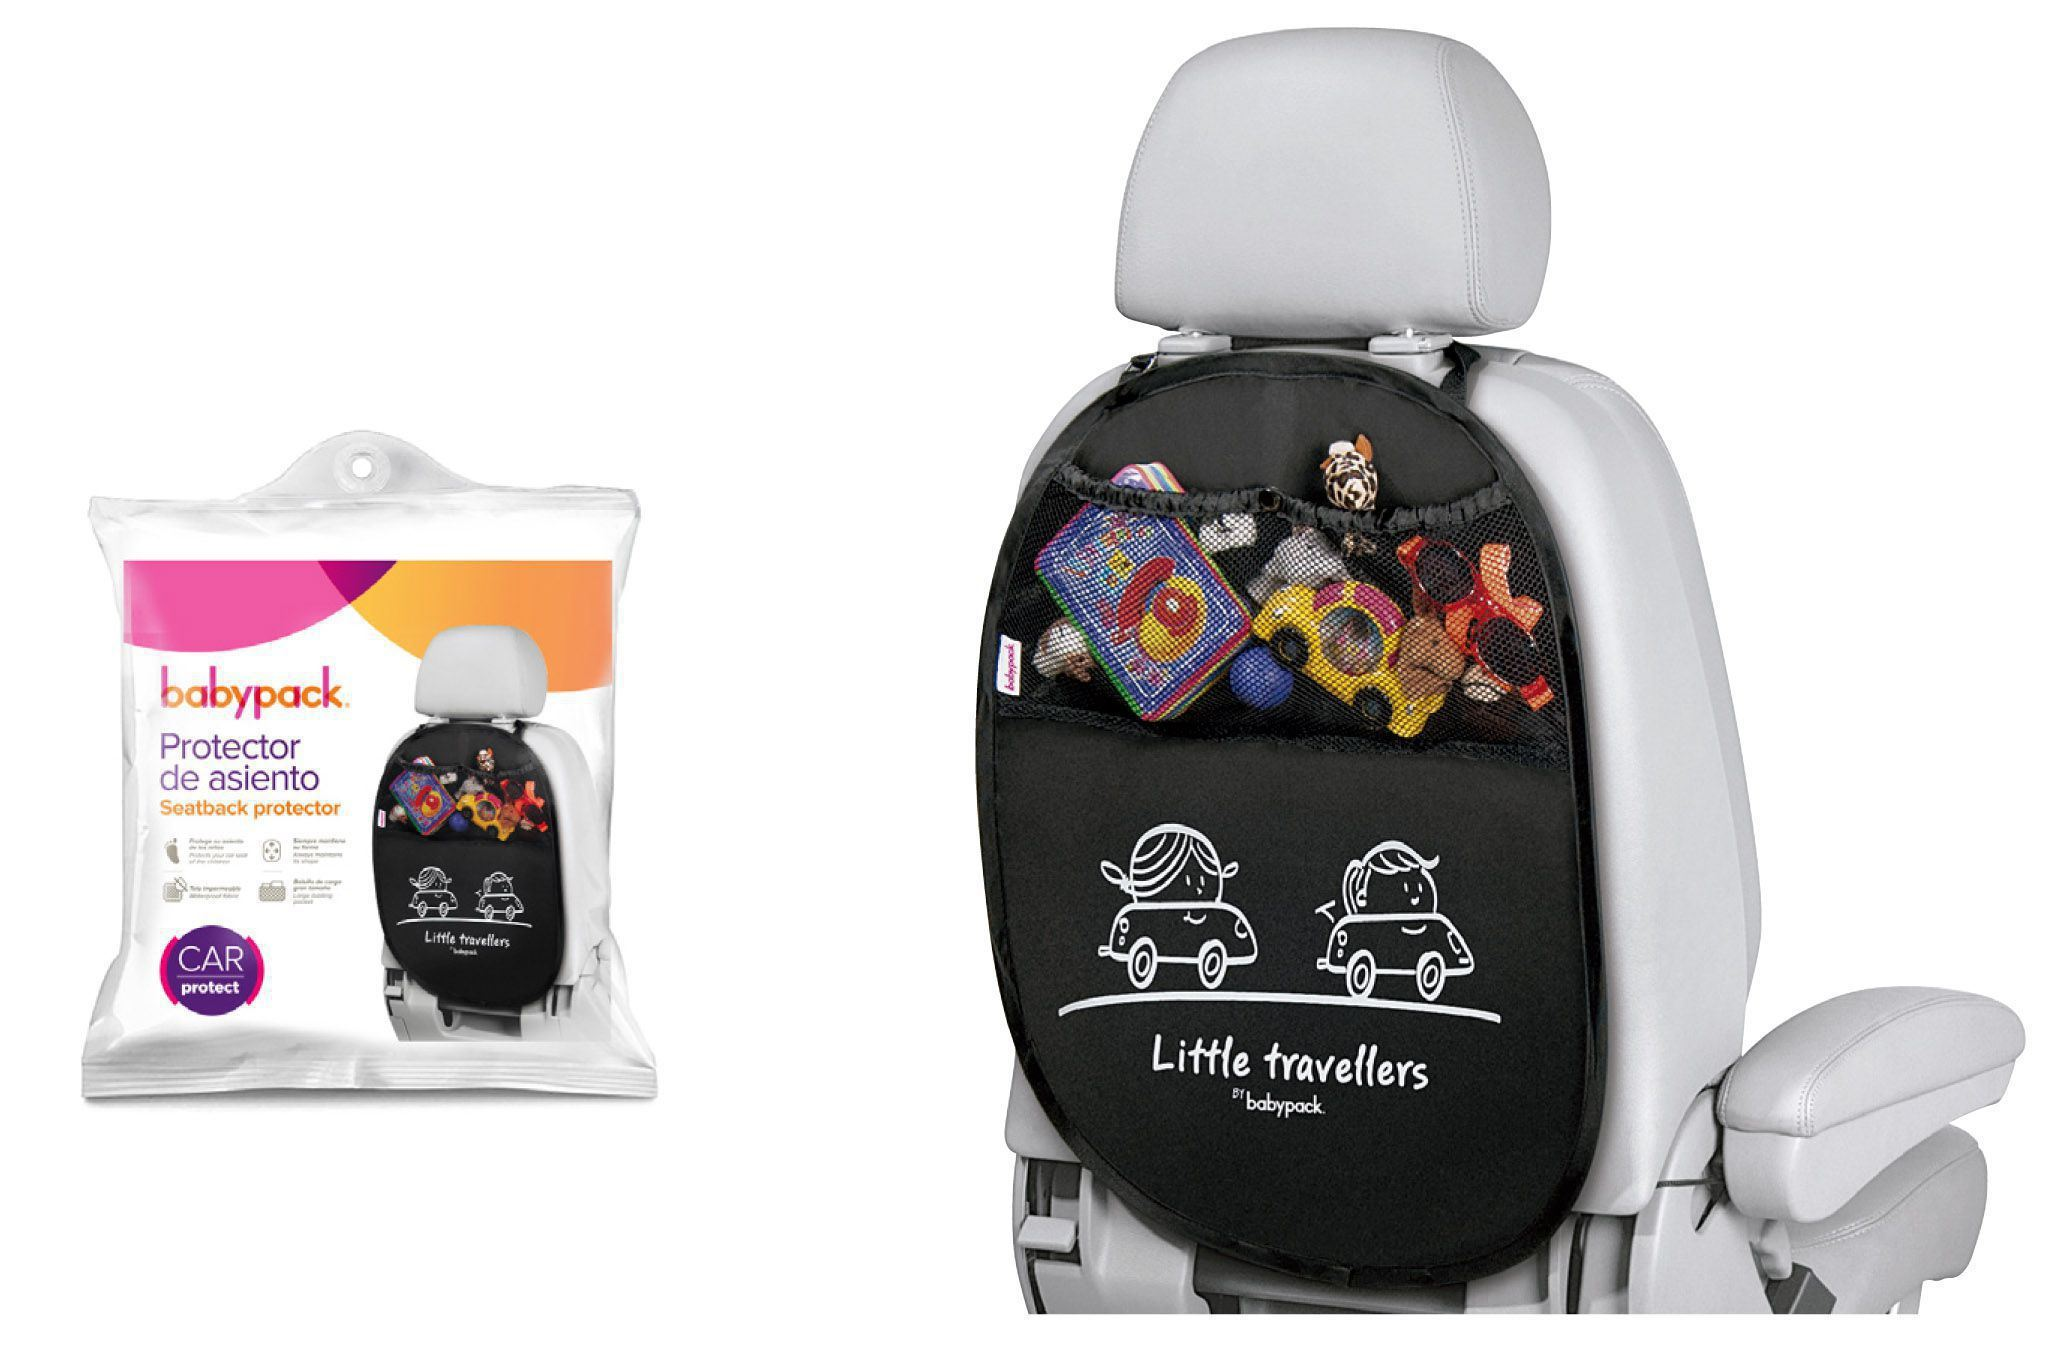 Protector de asiento Babypack